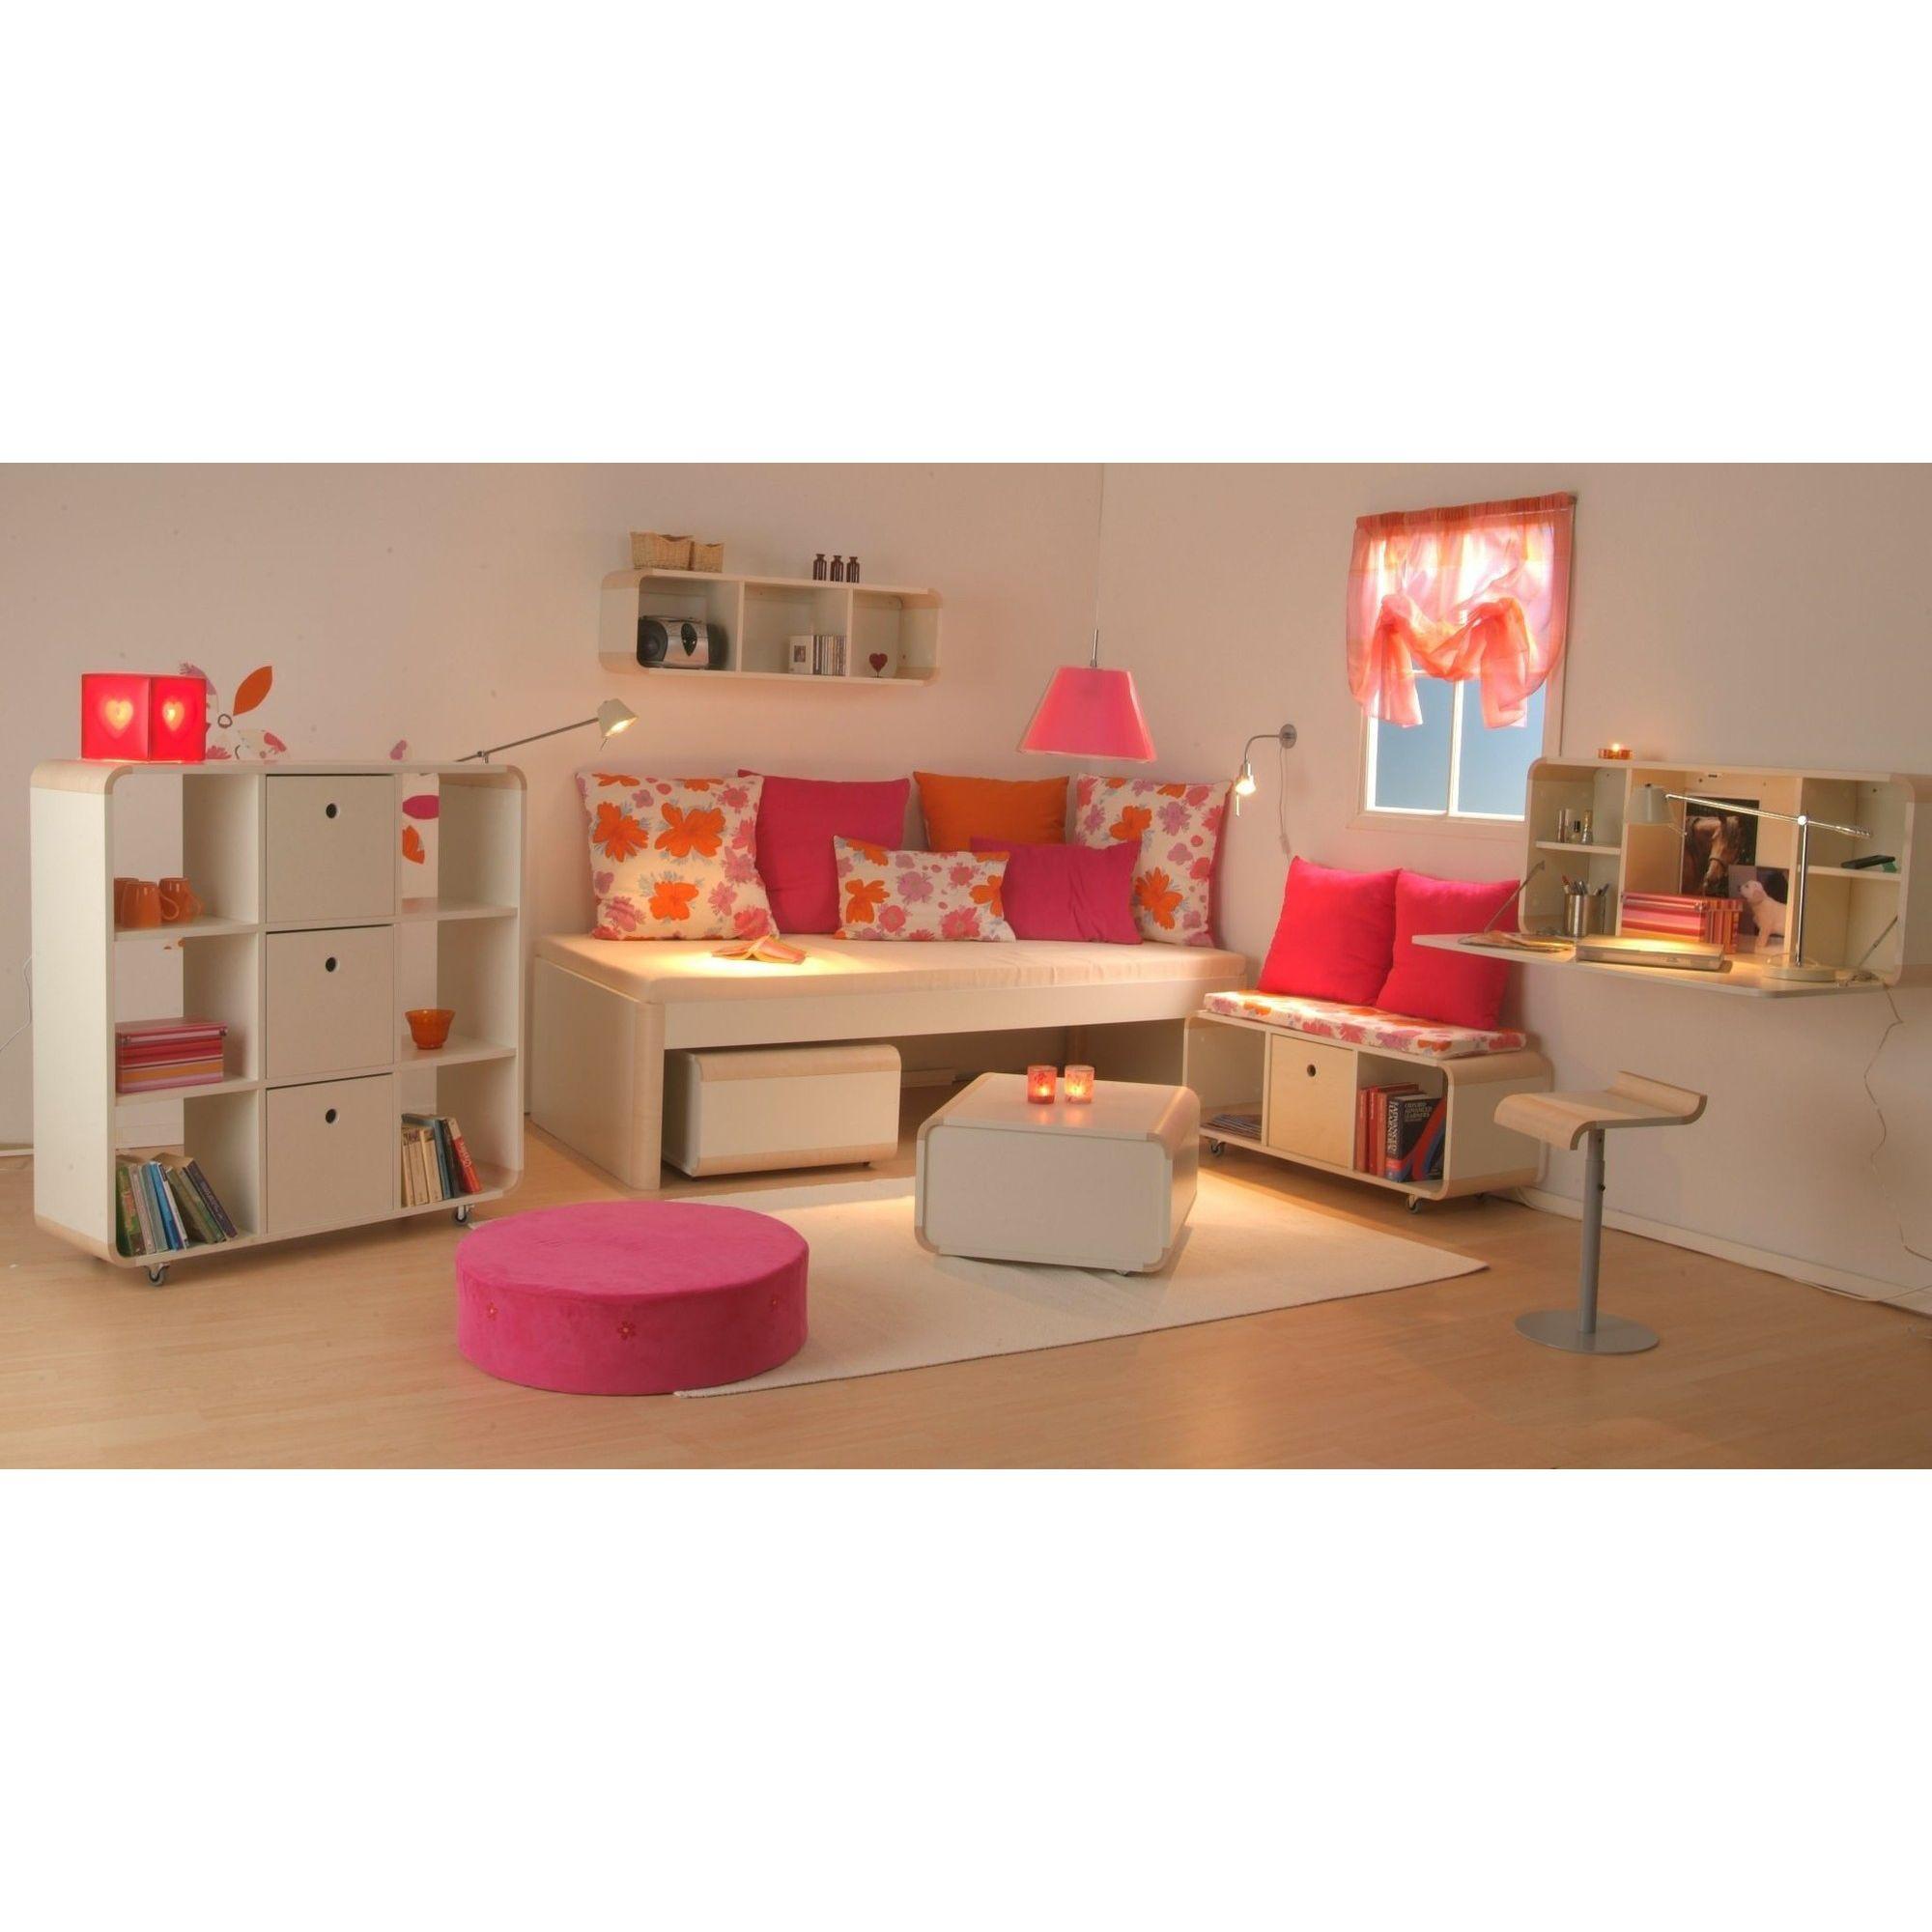 ''Junior living bookcase ''''3'''', white'' at Tesco Direct